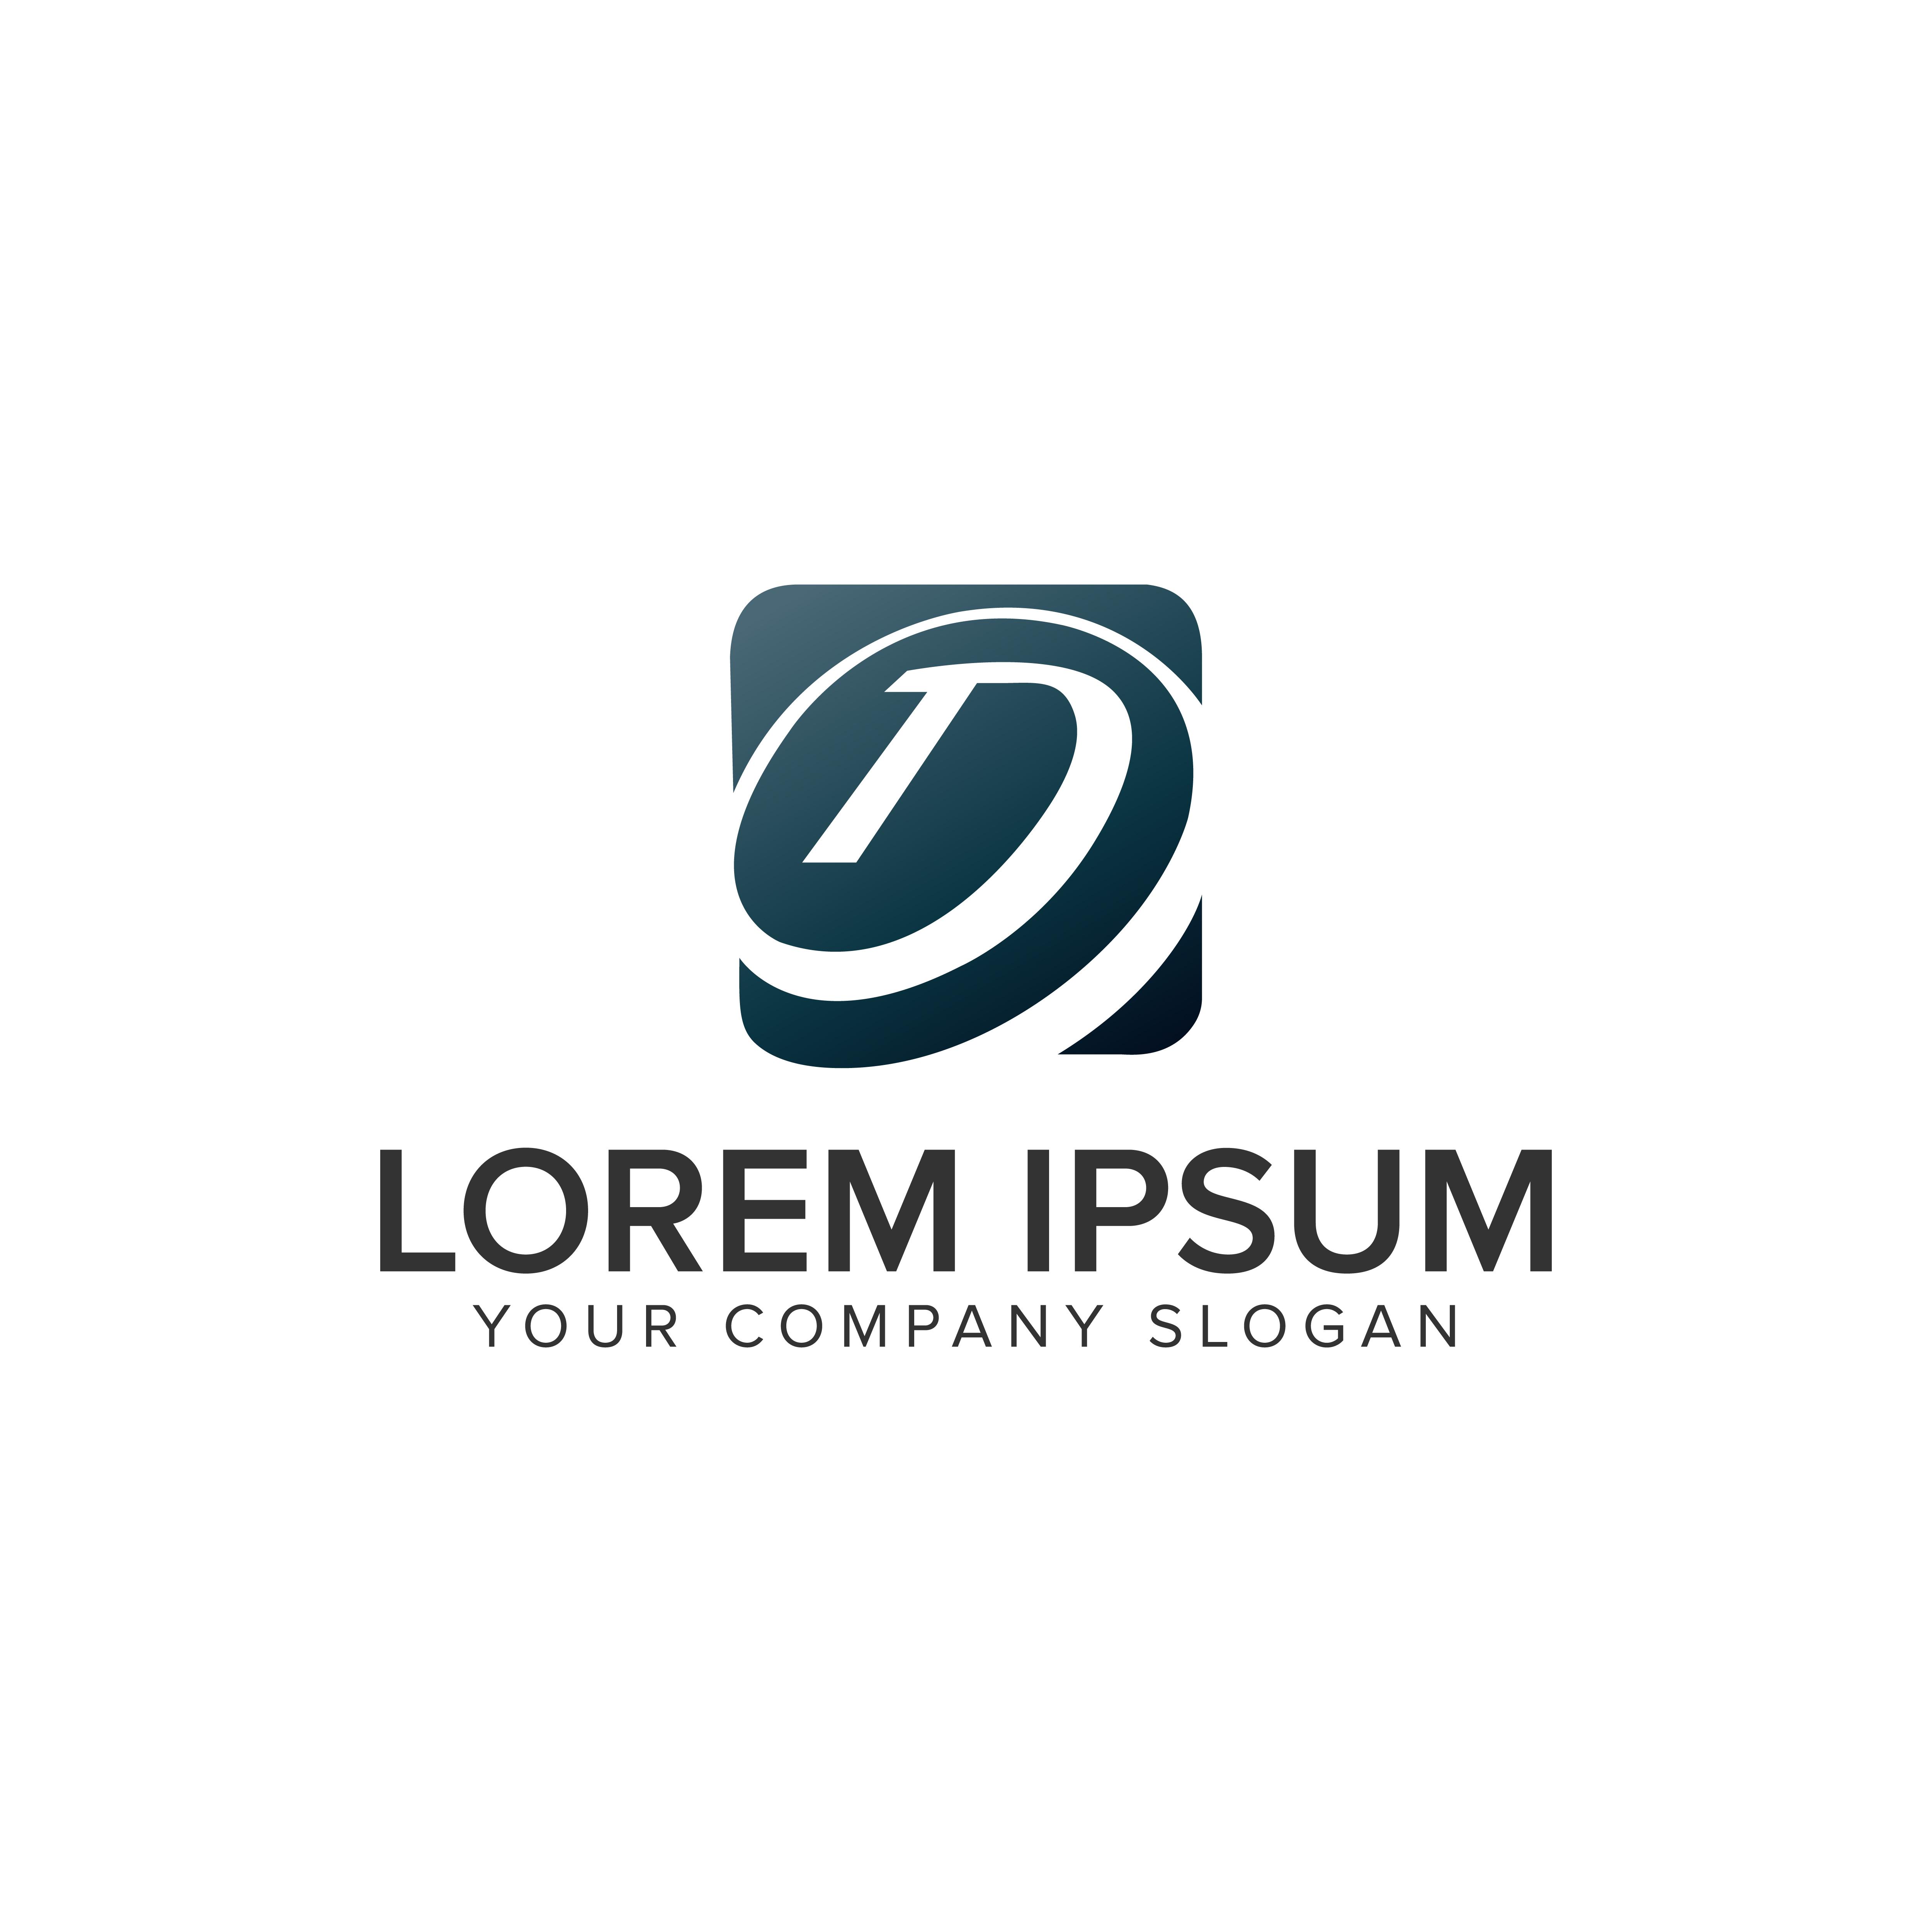 Letter D Logo Square Logo Design Concept Template. Fully